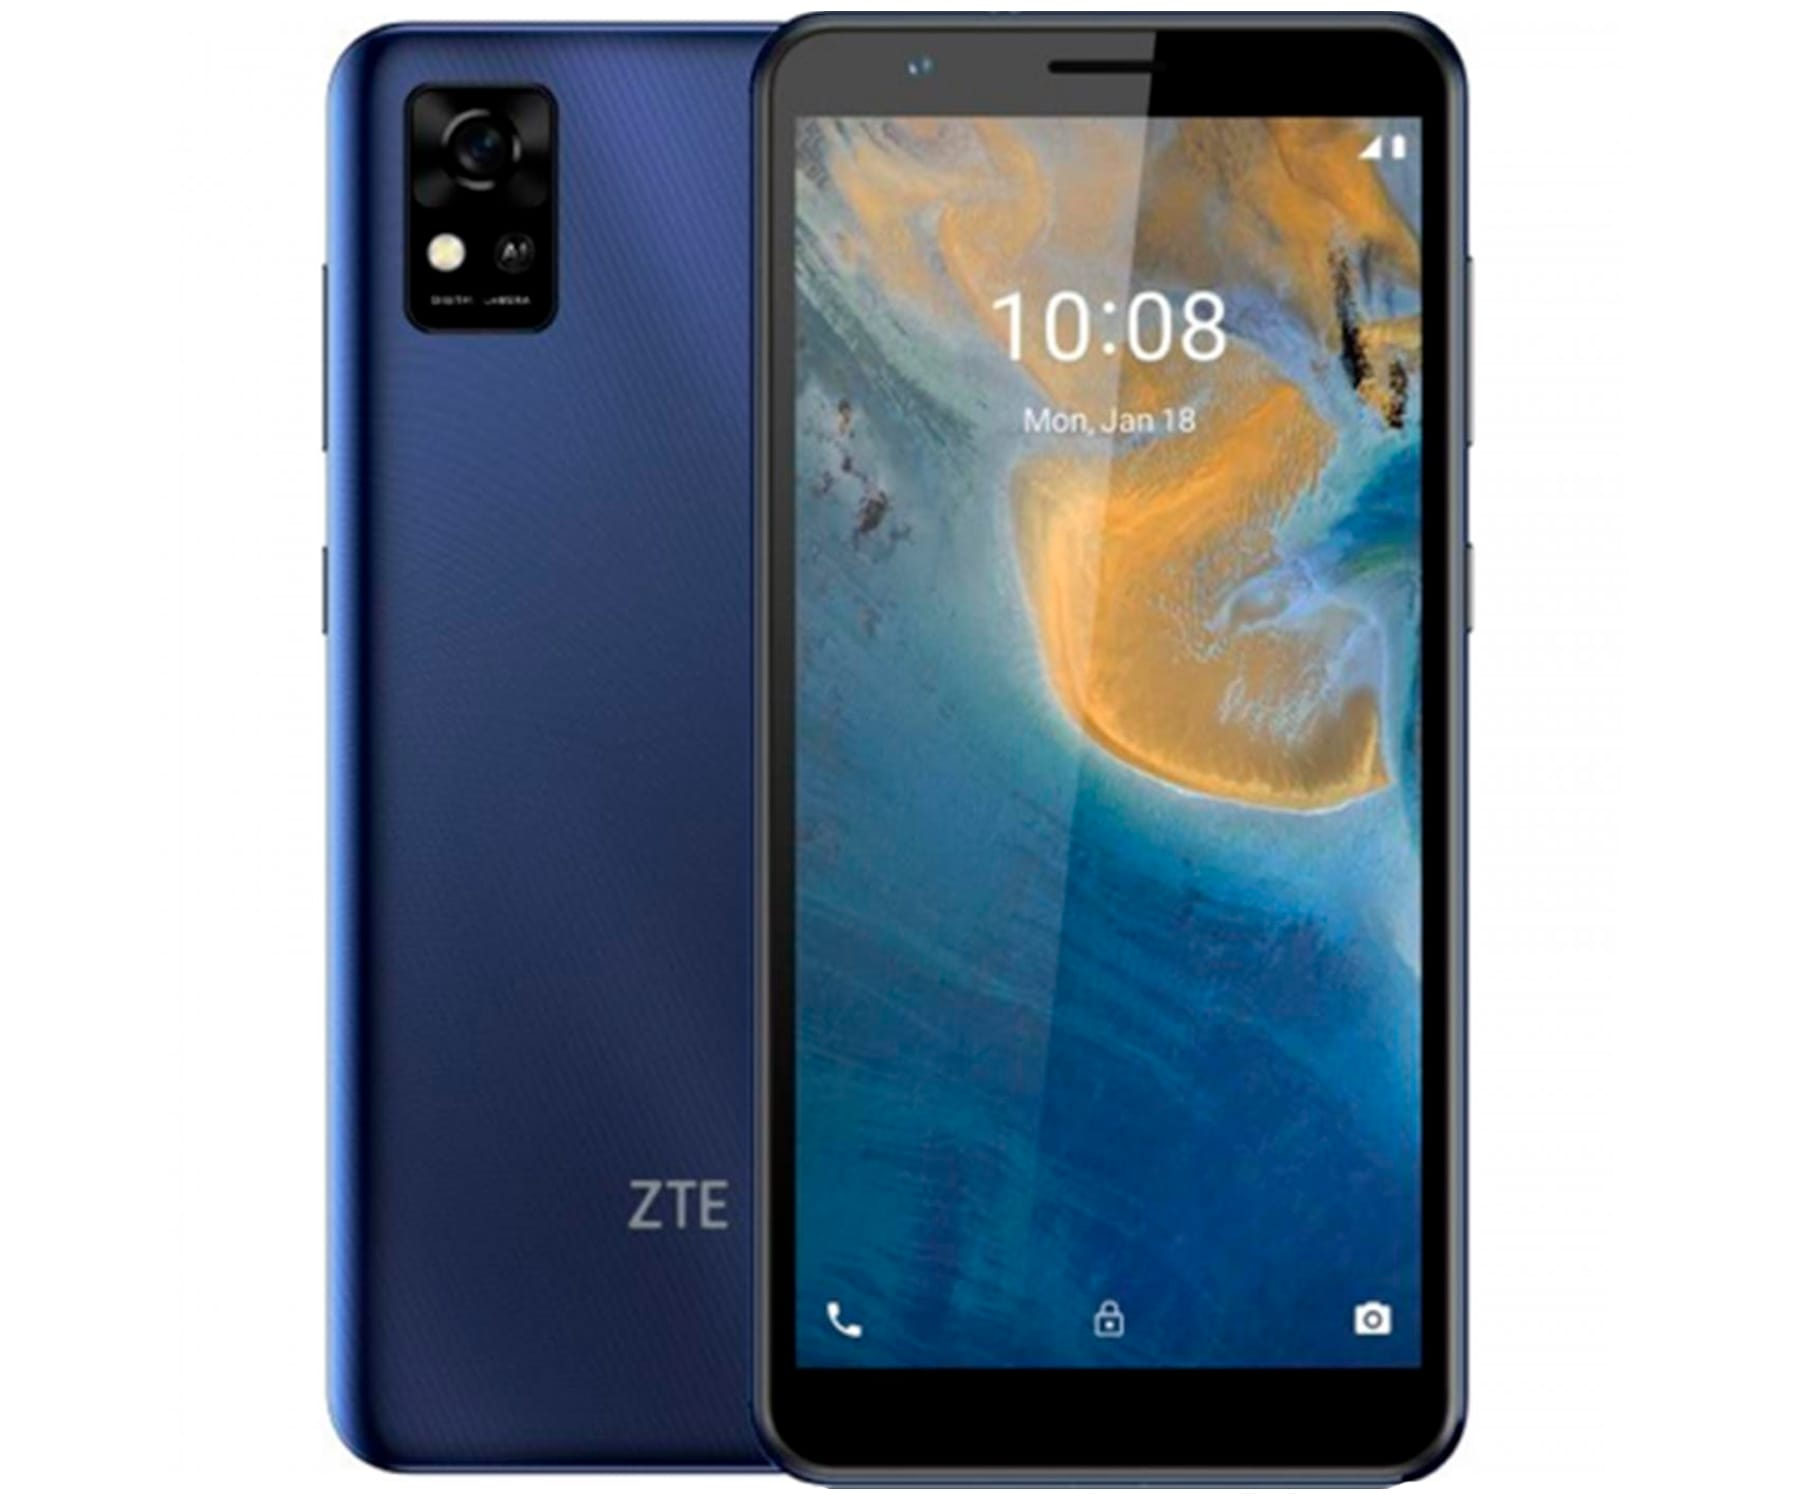 "ZTE BLADE A31 AZUL / 2+32GB / 5.45"" / DUAL SIM"